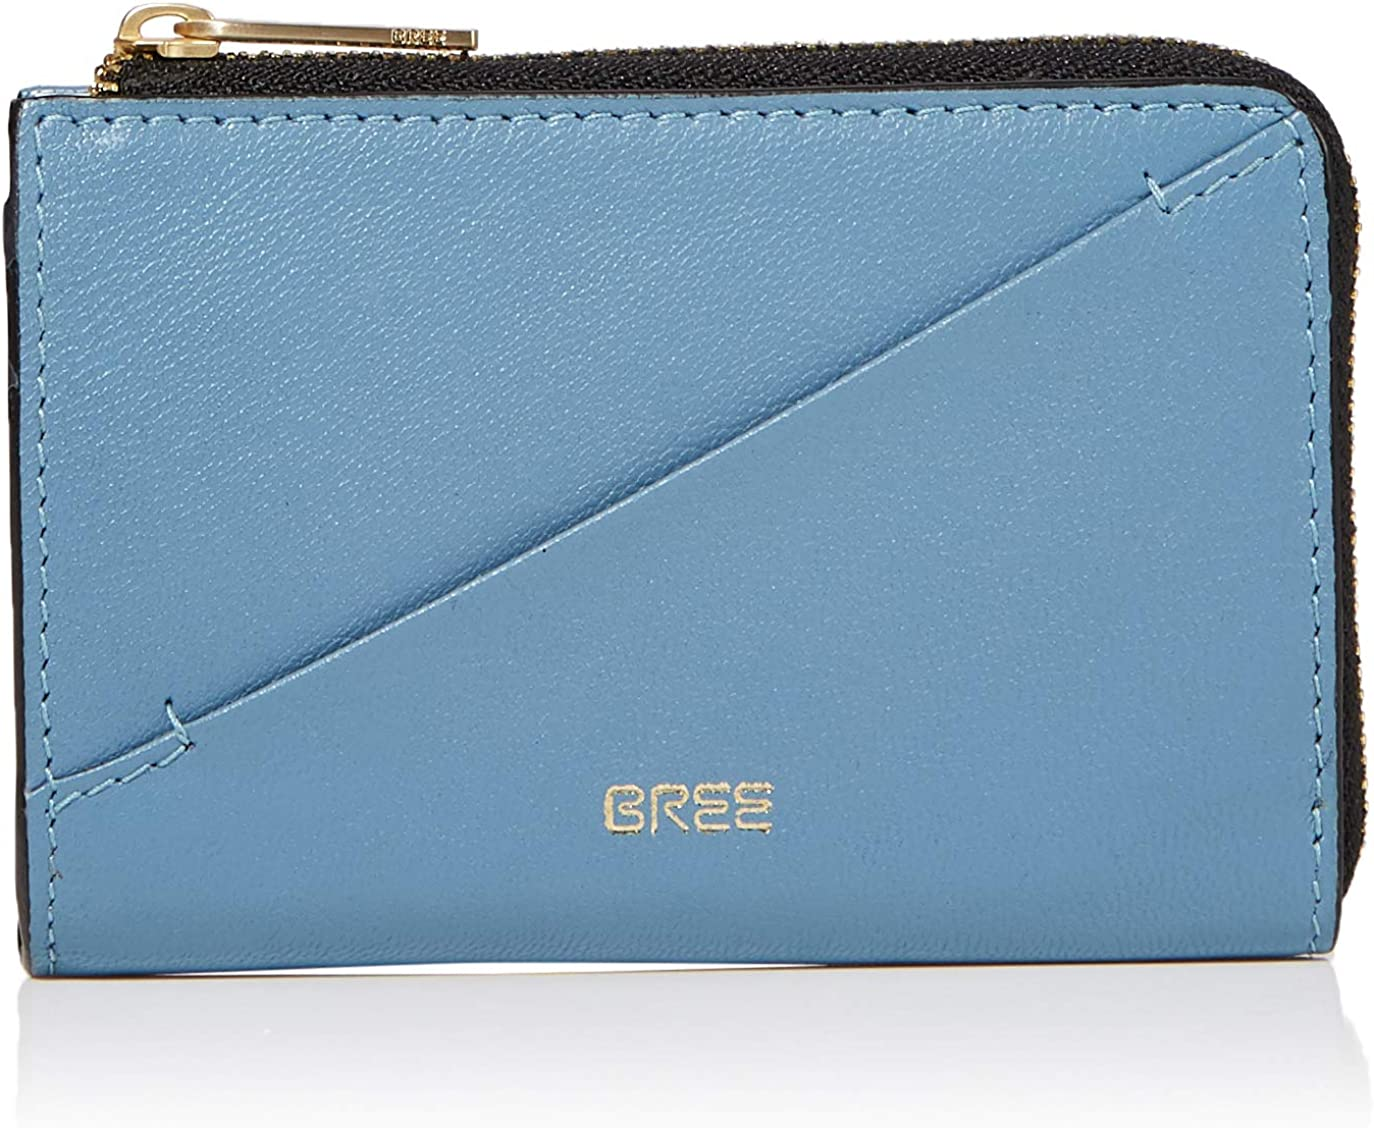 Provenc BREE Damen Privy 149 Provincial Blue 8.5x2x12 cm Blau Key Pouch W19 Schl/üsselm/äppchen